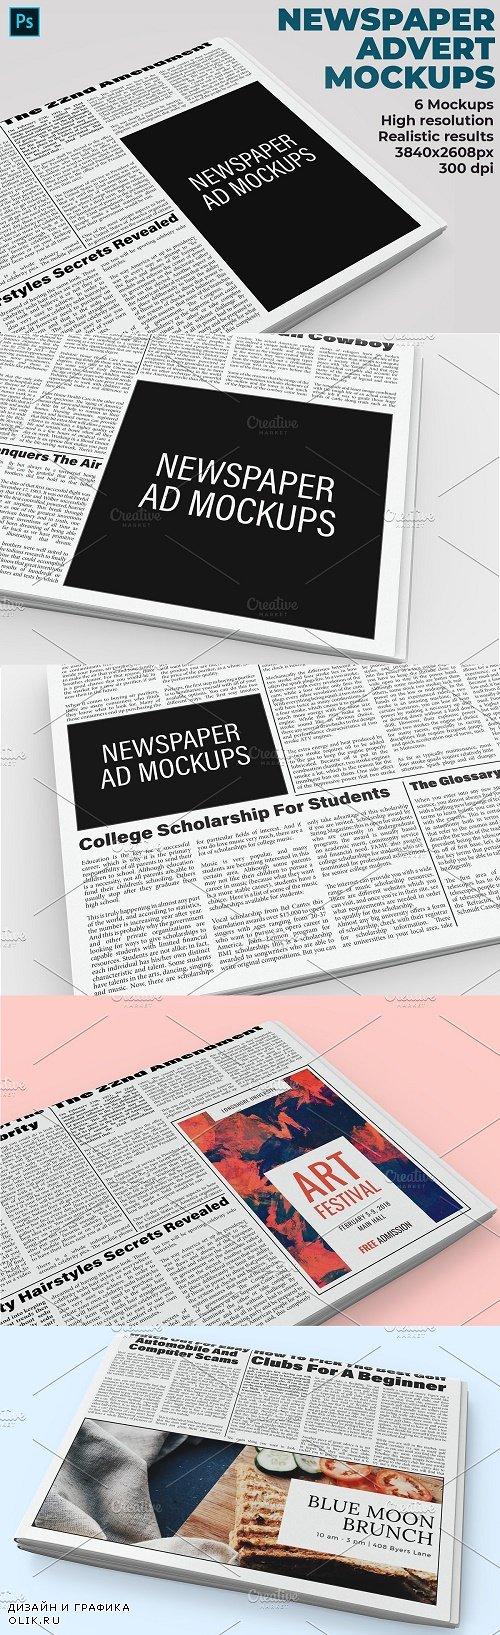 Newspaper Advert Mockups - 4493945